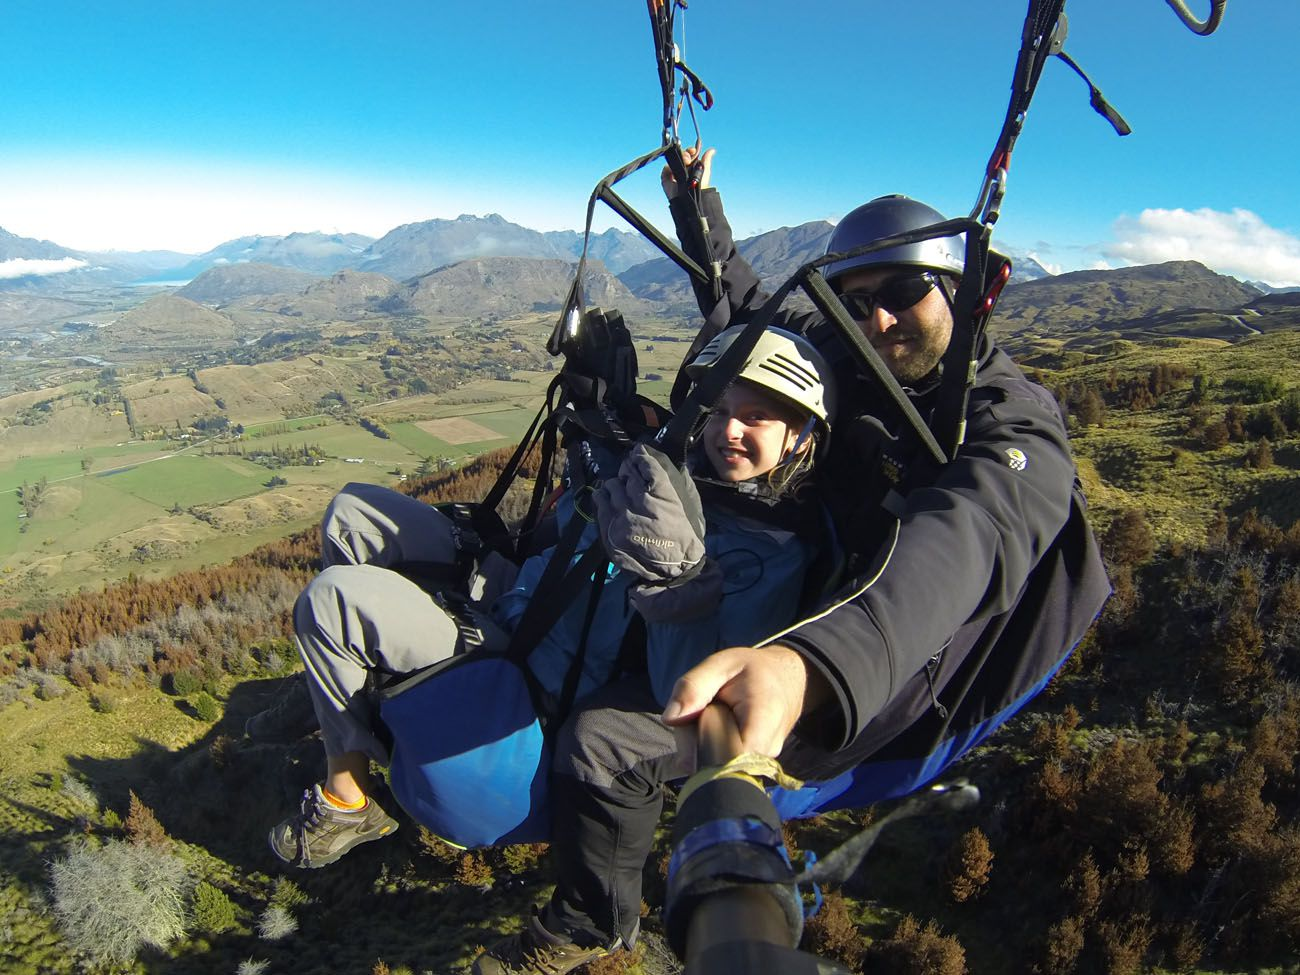 Kara Paragliding